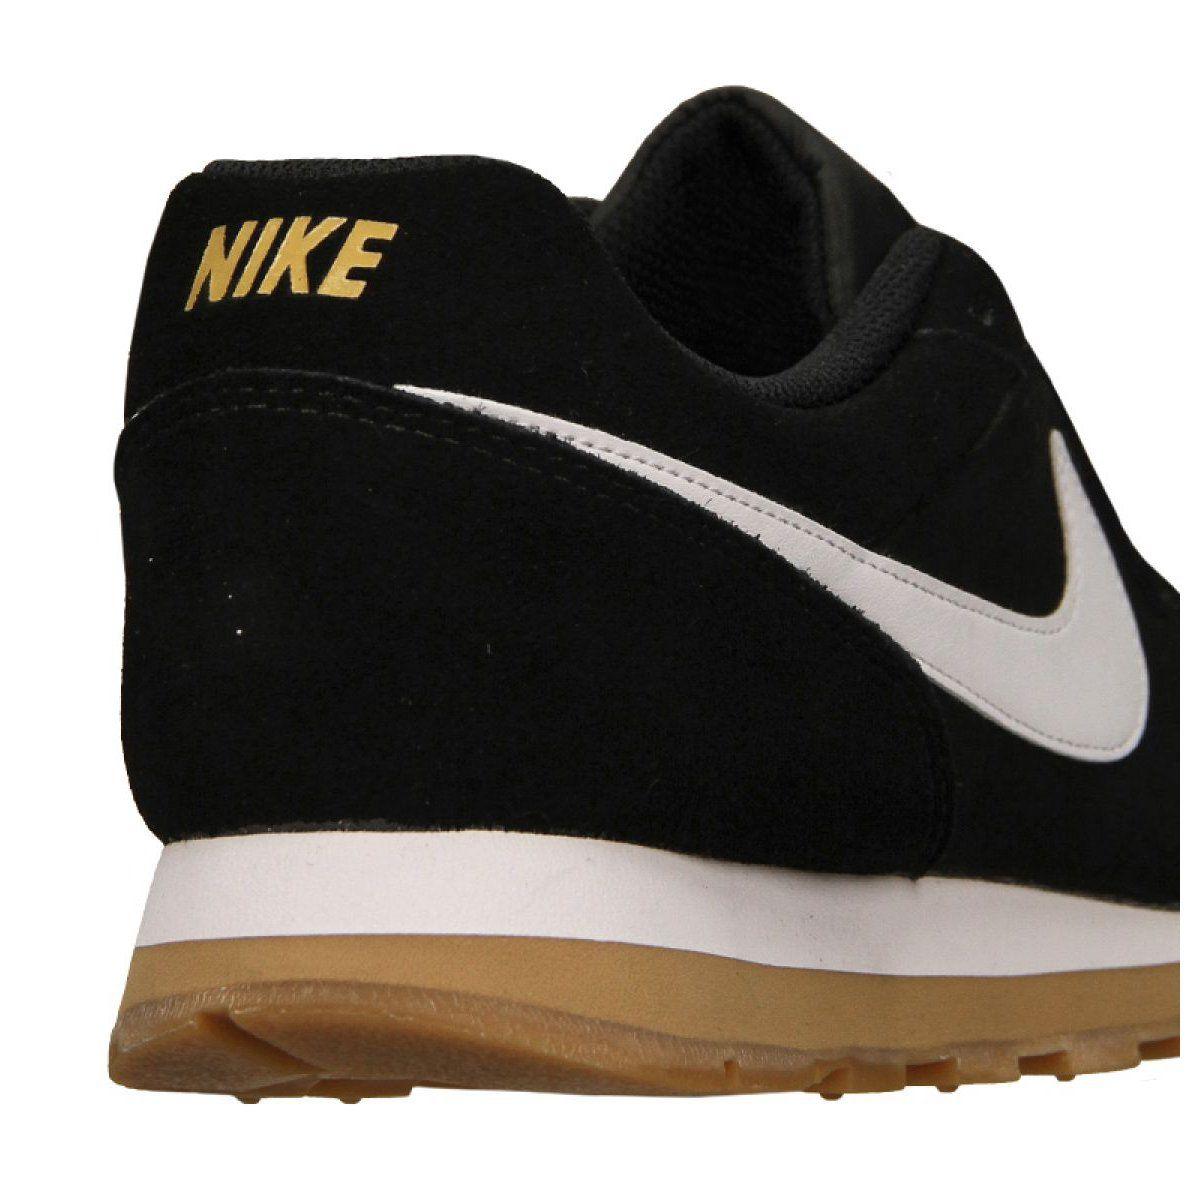 Buty Nike Md Runner 2 Suede M Aq9211 001 Czarne Mens Nike Shoes Black Shoes Nike Men